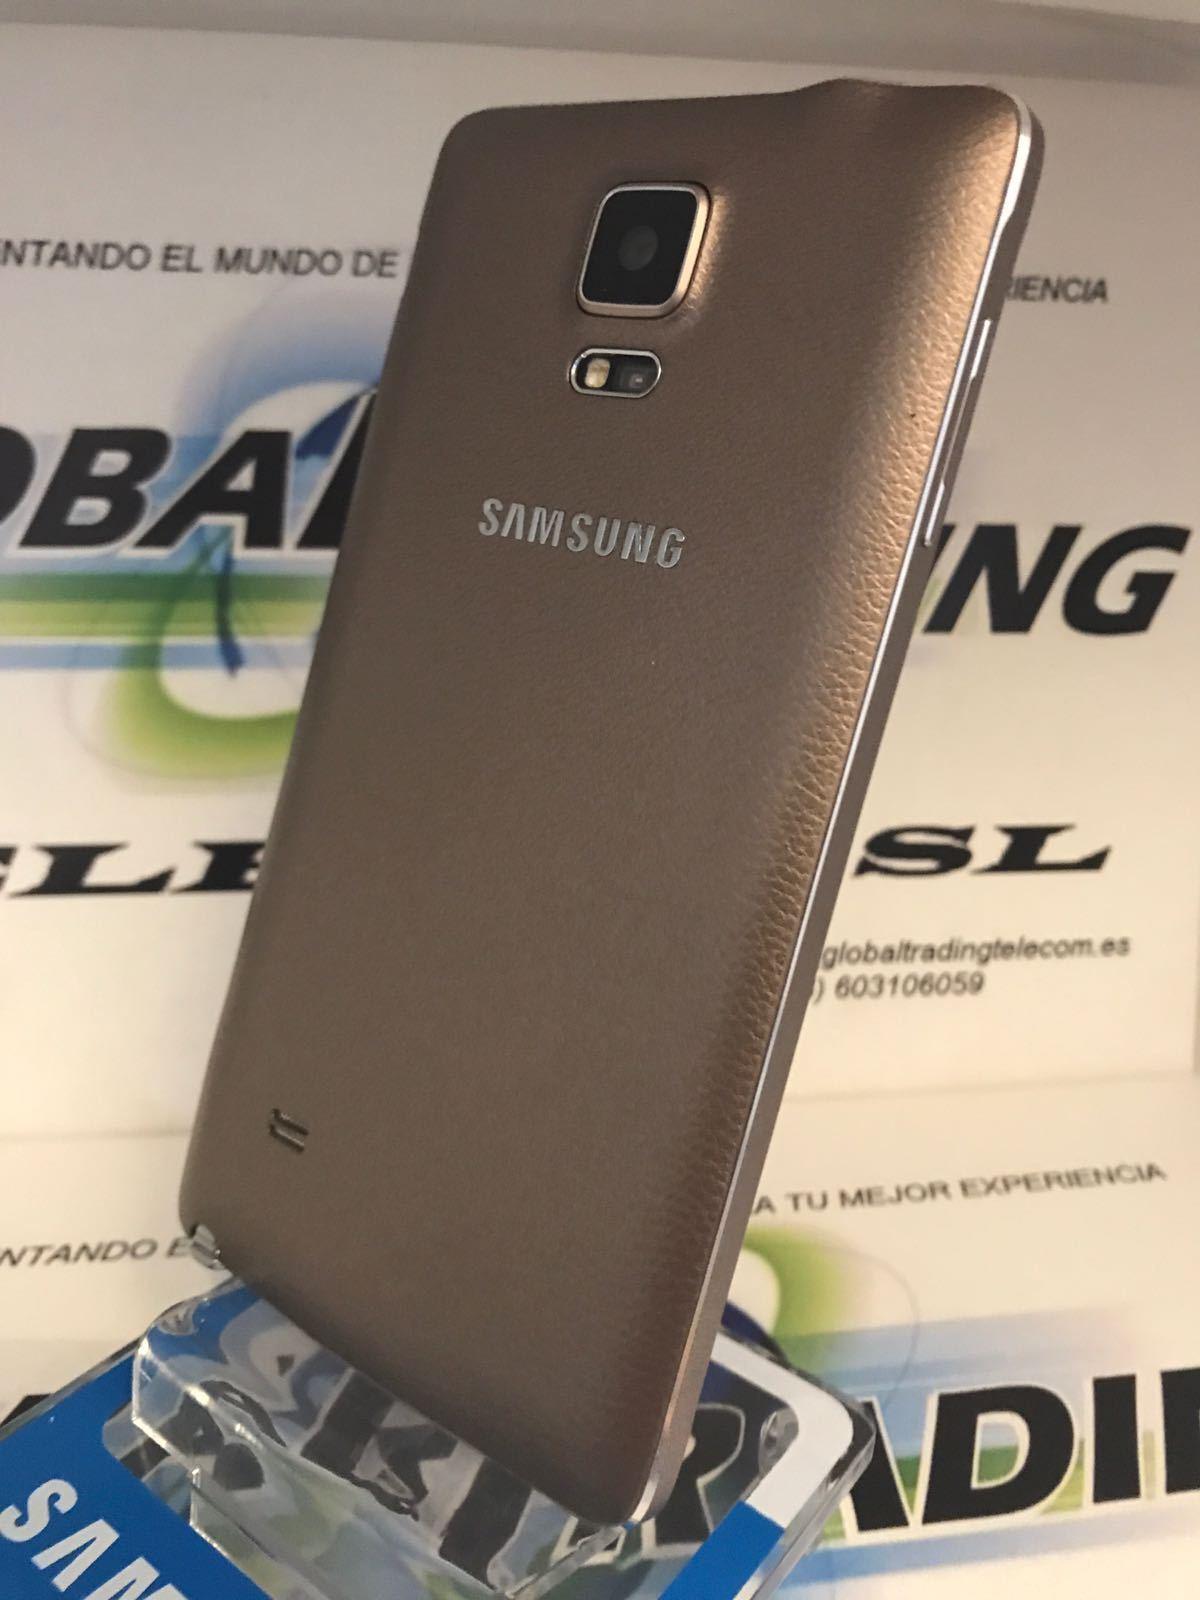 Telefono Samsung Galaxy Note 4 Sm N910f 32gb Oro Bronce